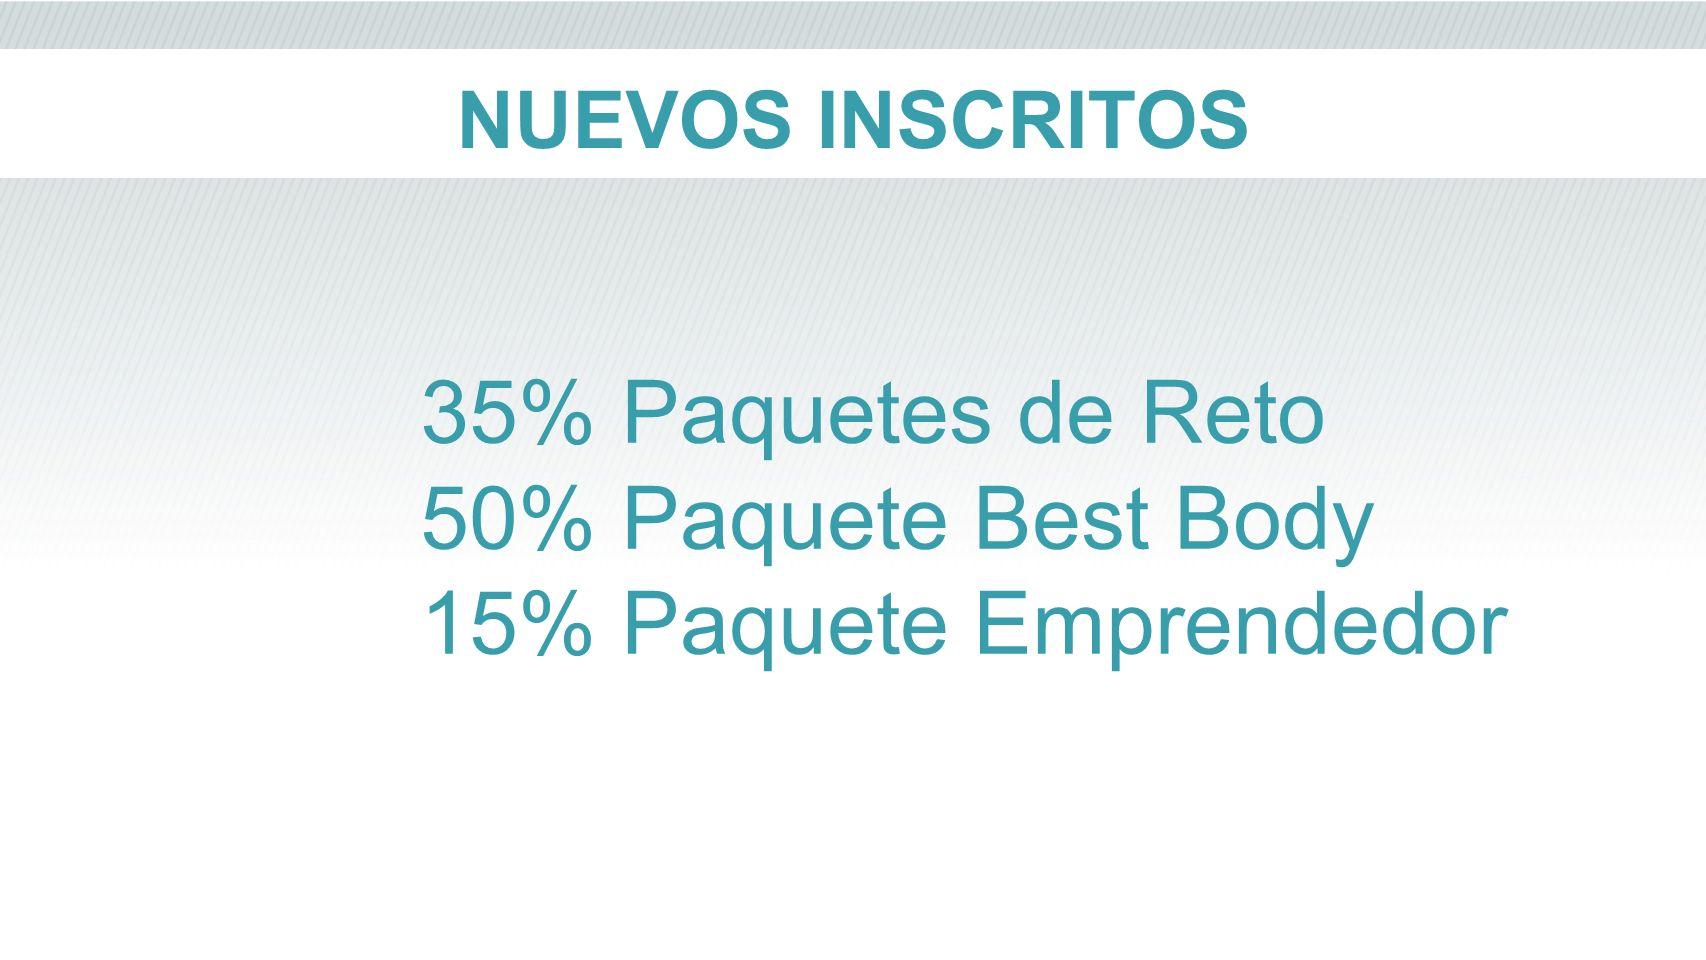 35% Paquetes de Reto 50% Paquete Best Body 15% Paquete Emprendedor NUEVOS INSCRITOS